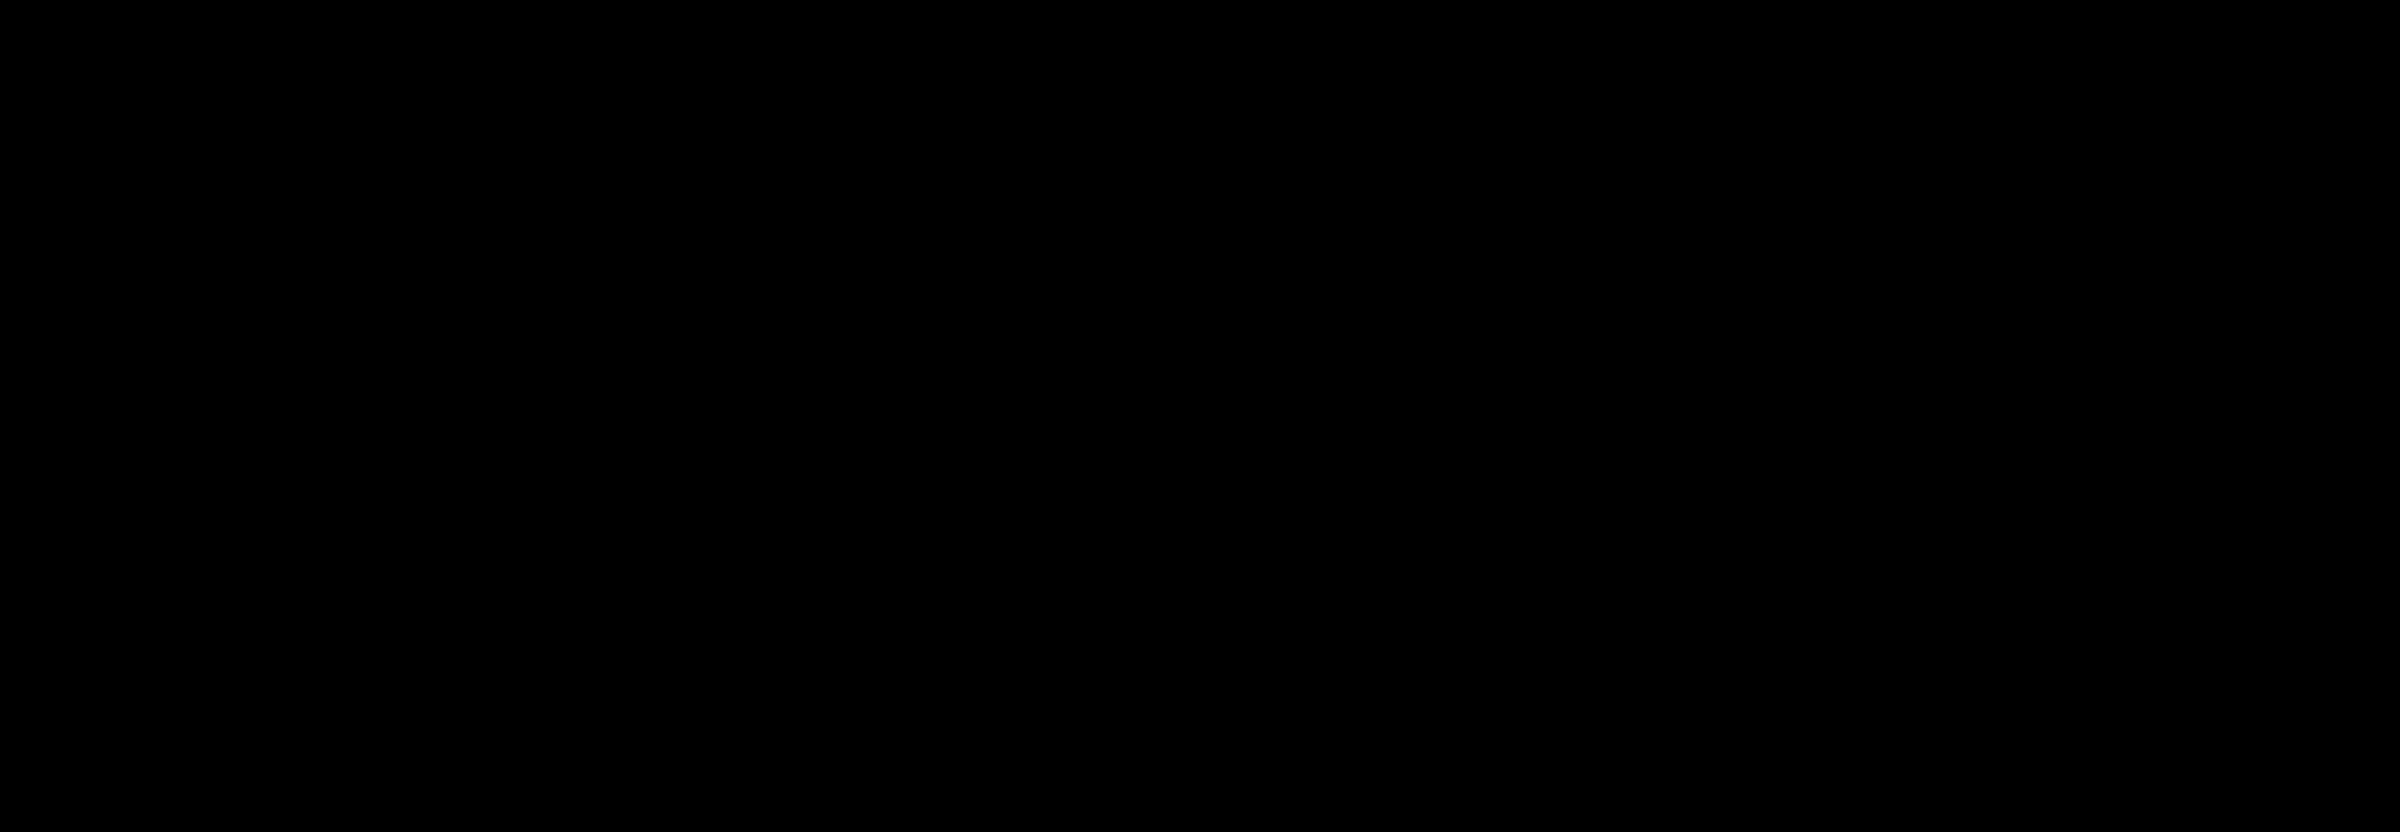 Nestle logo black and white - Nestle Logo PNG